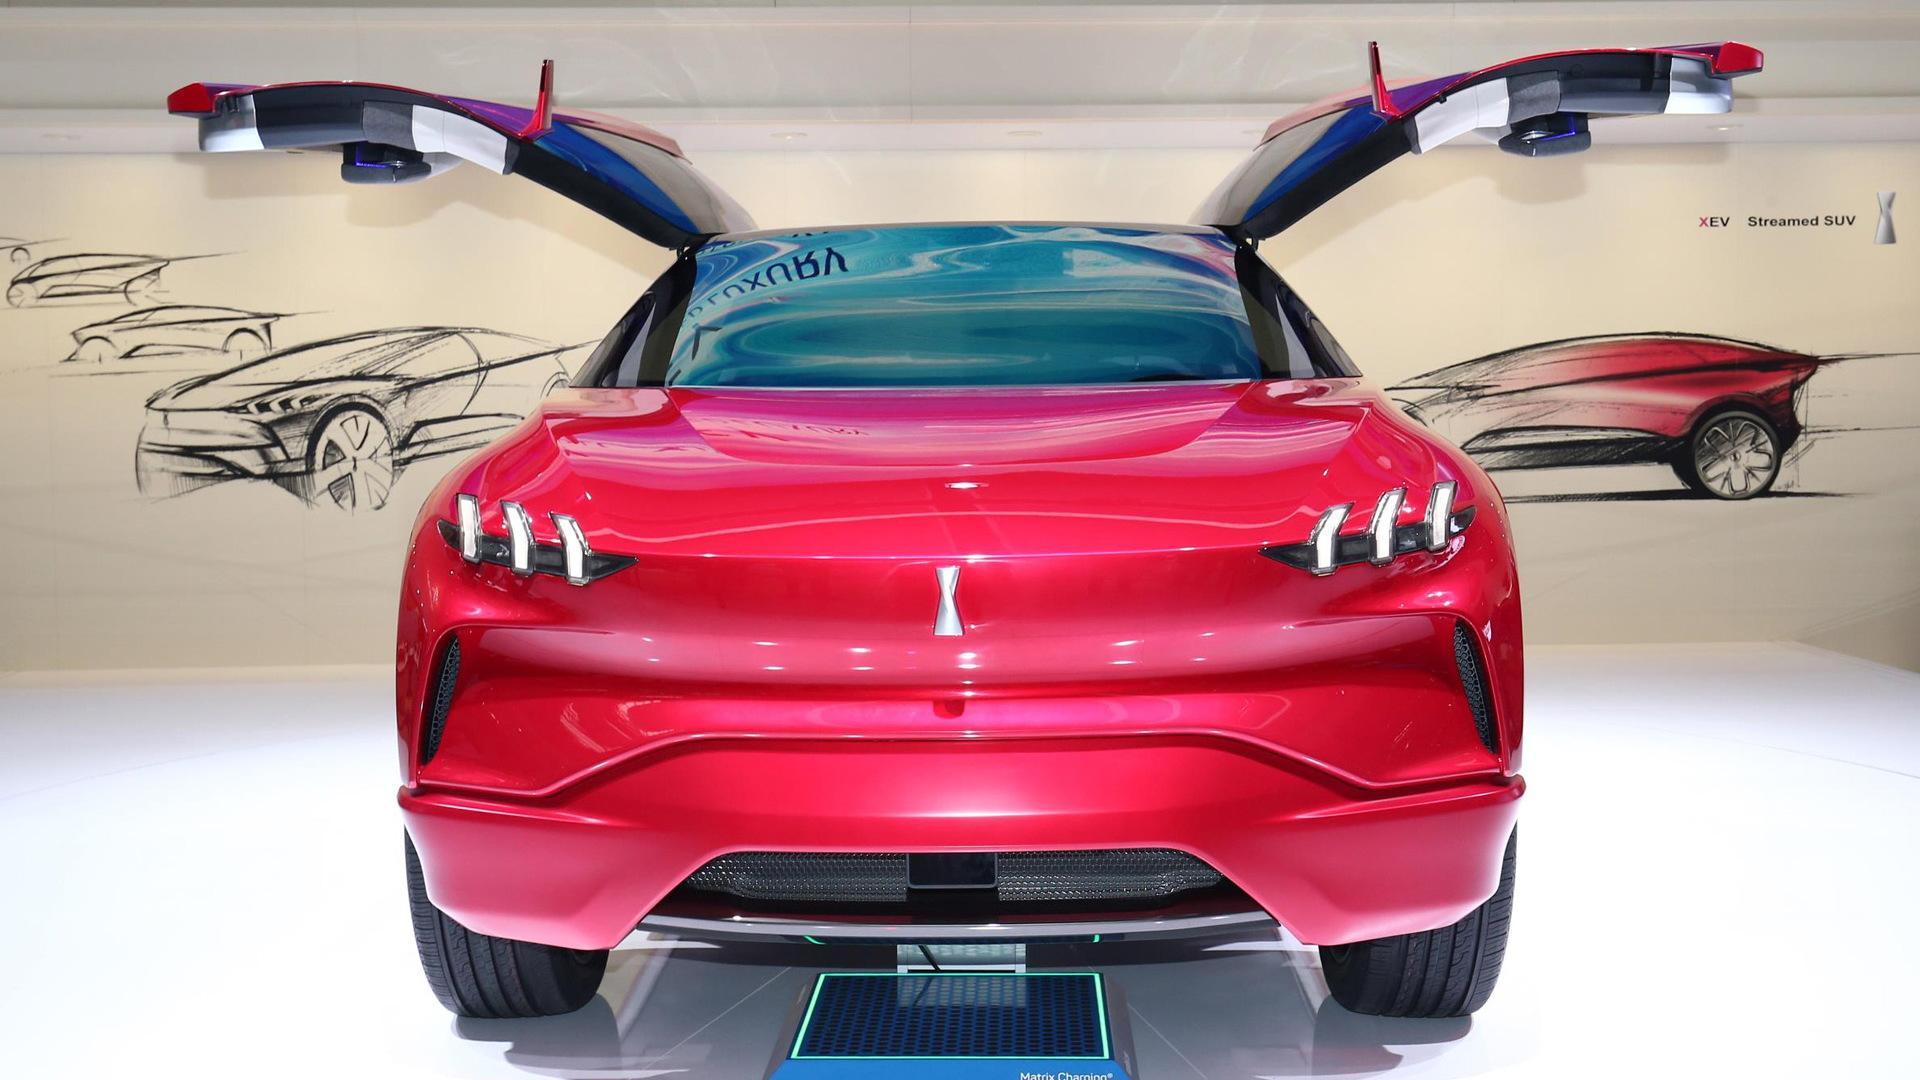 Wey XEV concept, 2017 Frankfurt Motor Show